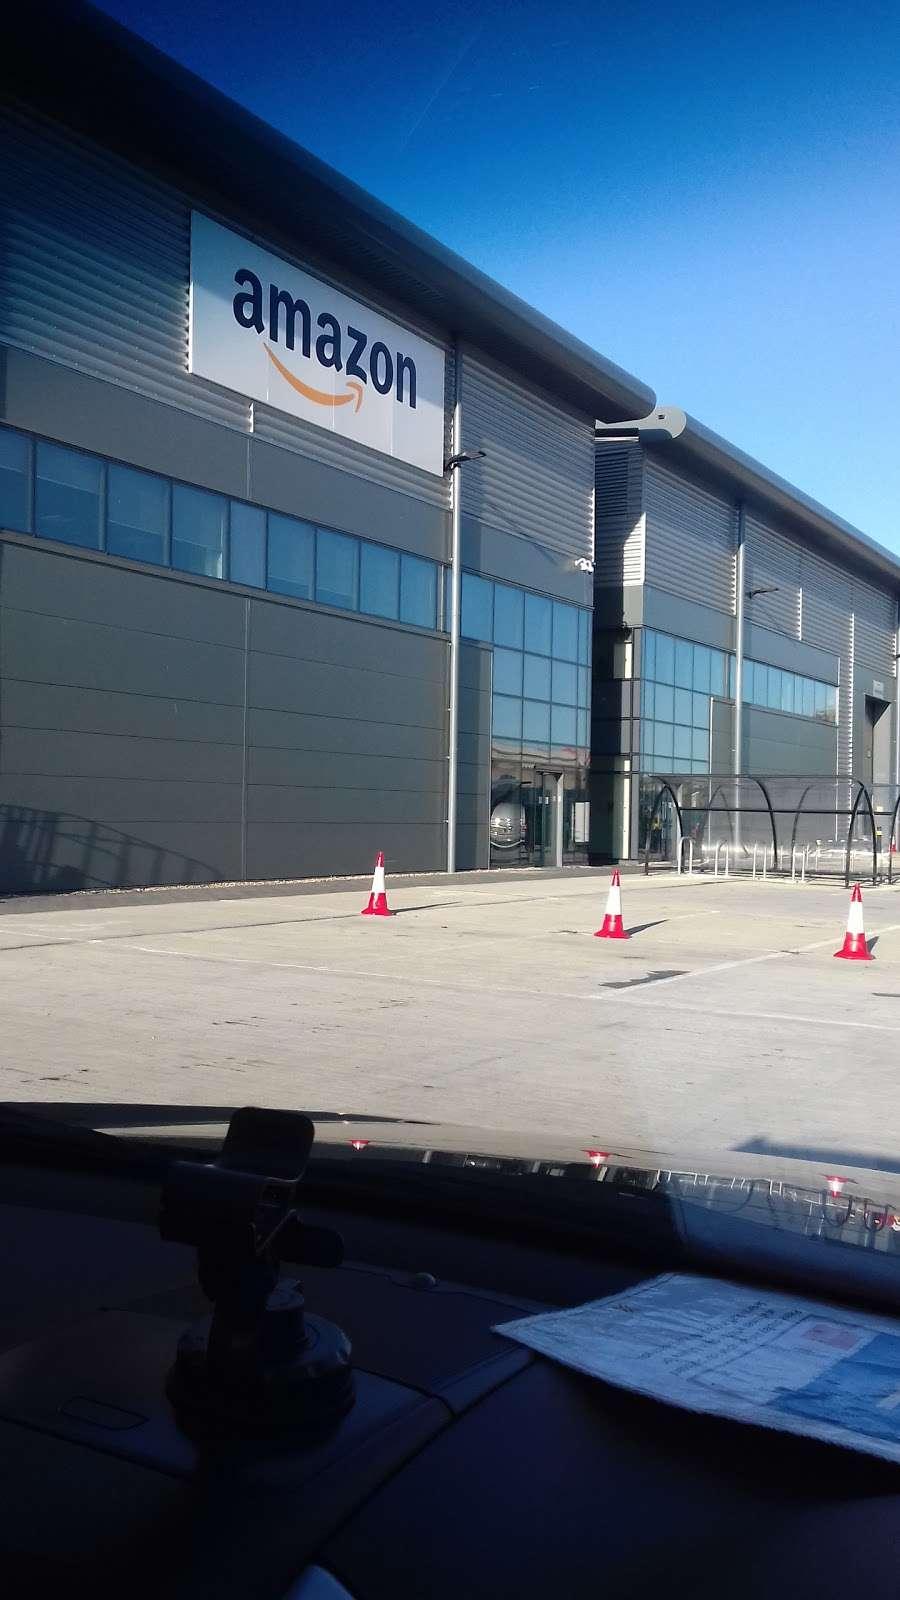 DBR1 Amazon Warehouse - storage    Photo 7 of 10   Address: 7 Crabtree Manorway N, Belvedere DA17 6AS, UK   Phone: 07468 087576